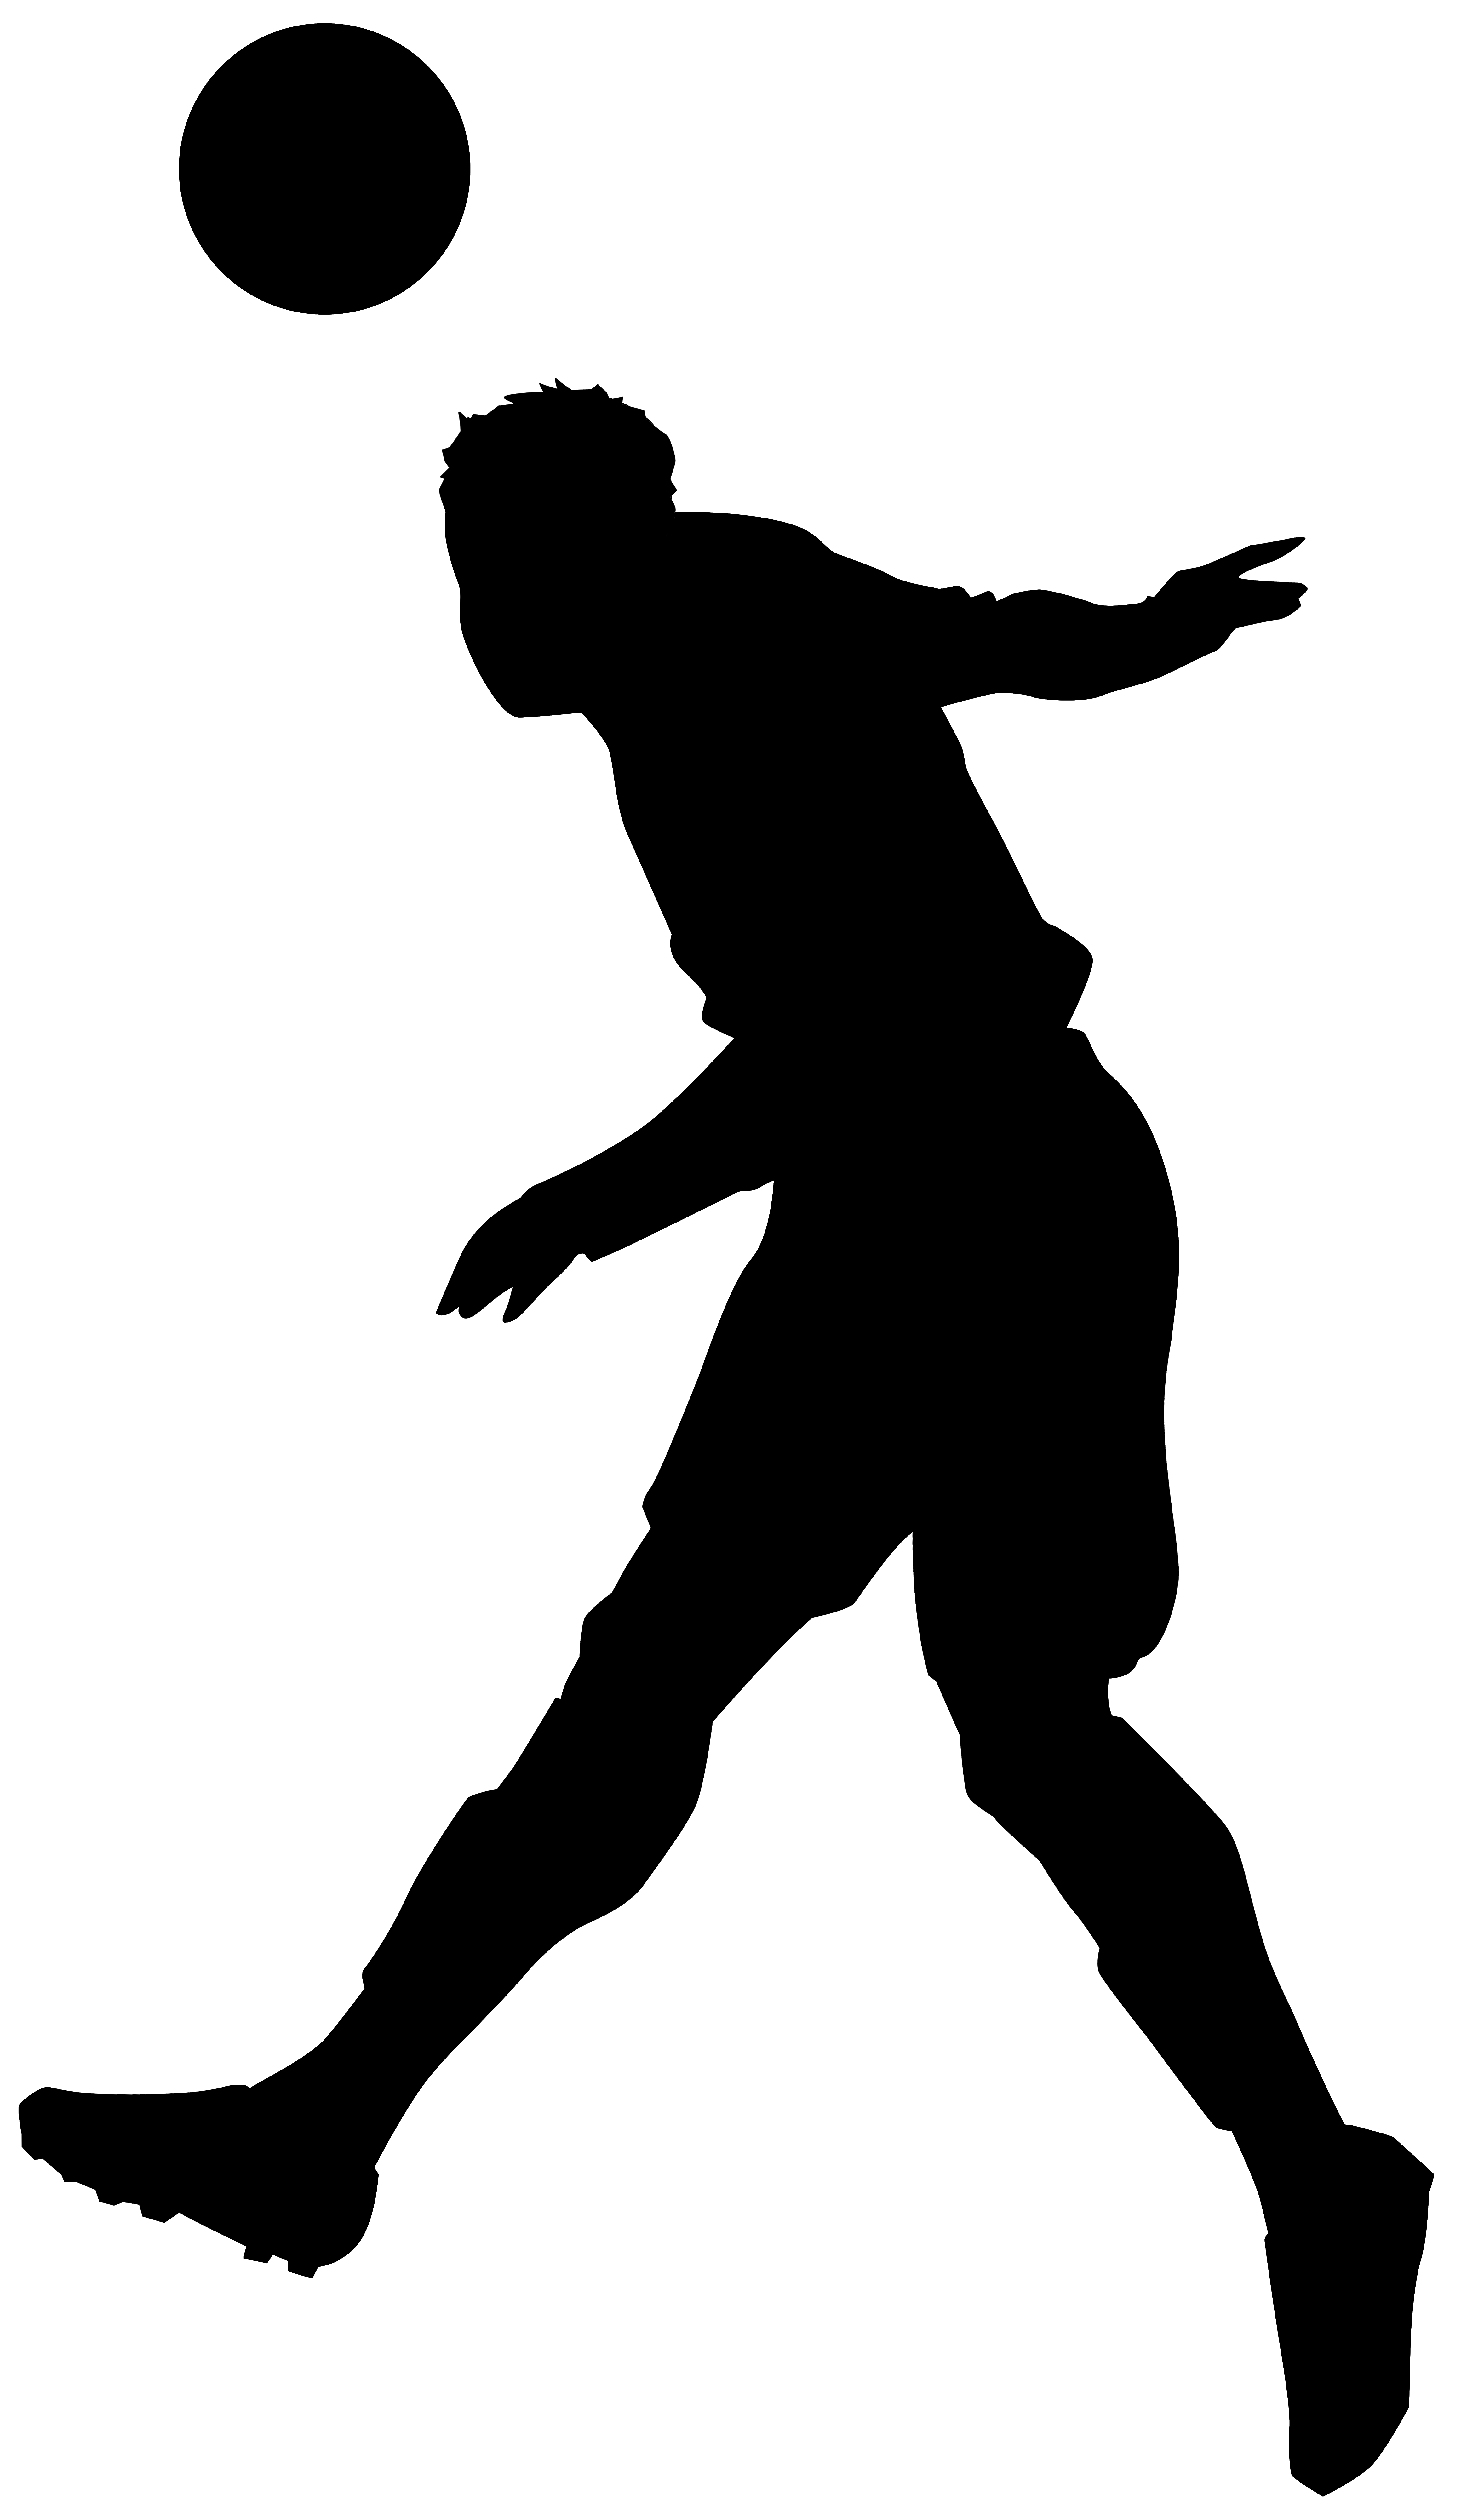 4638x8000 Footballer Silhouette Png Clip Art Imageu200b Gallery Yopriceville